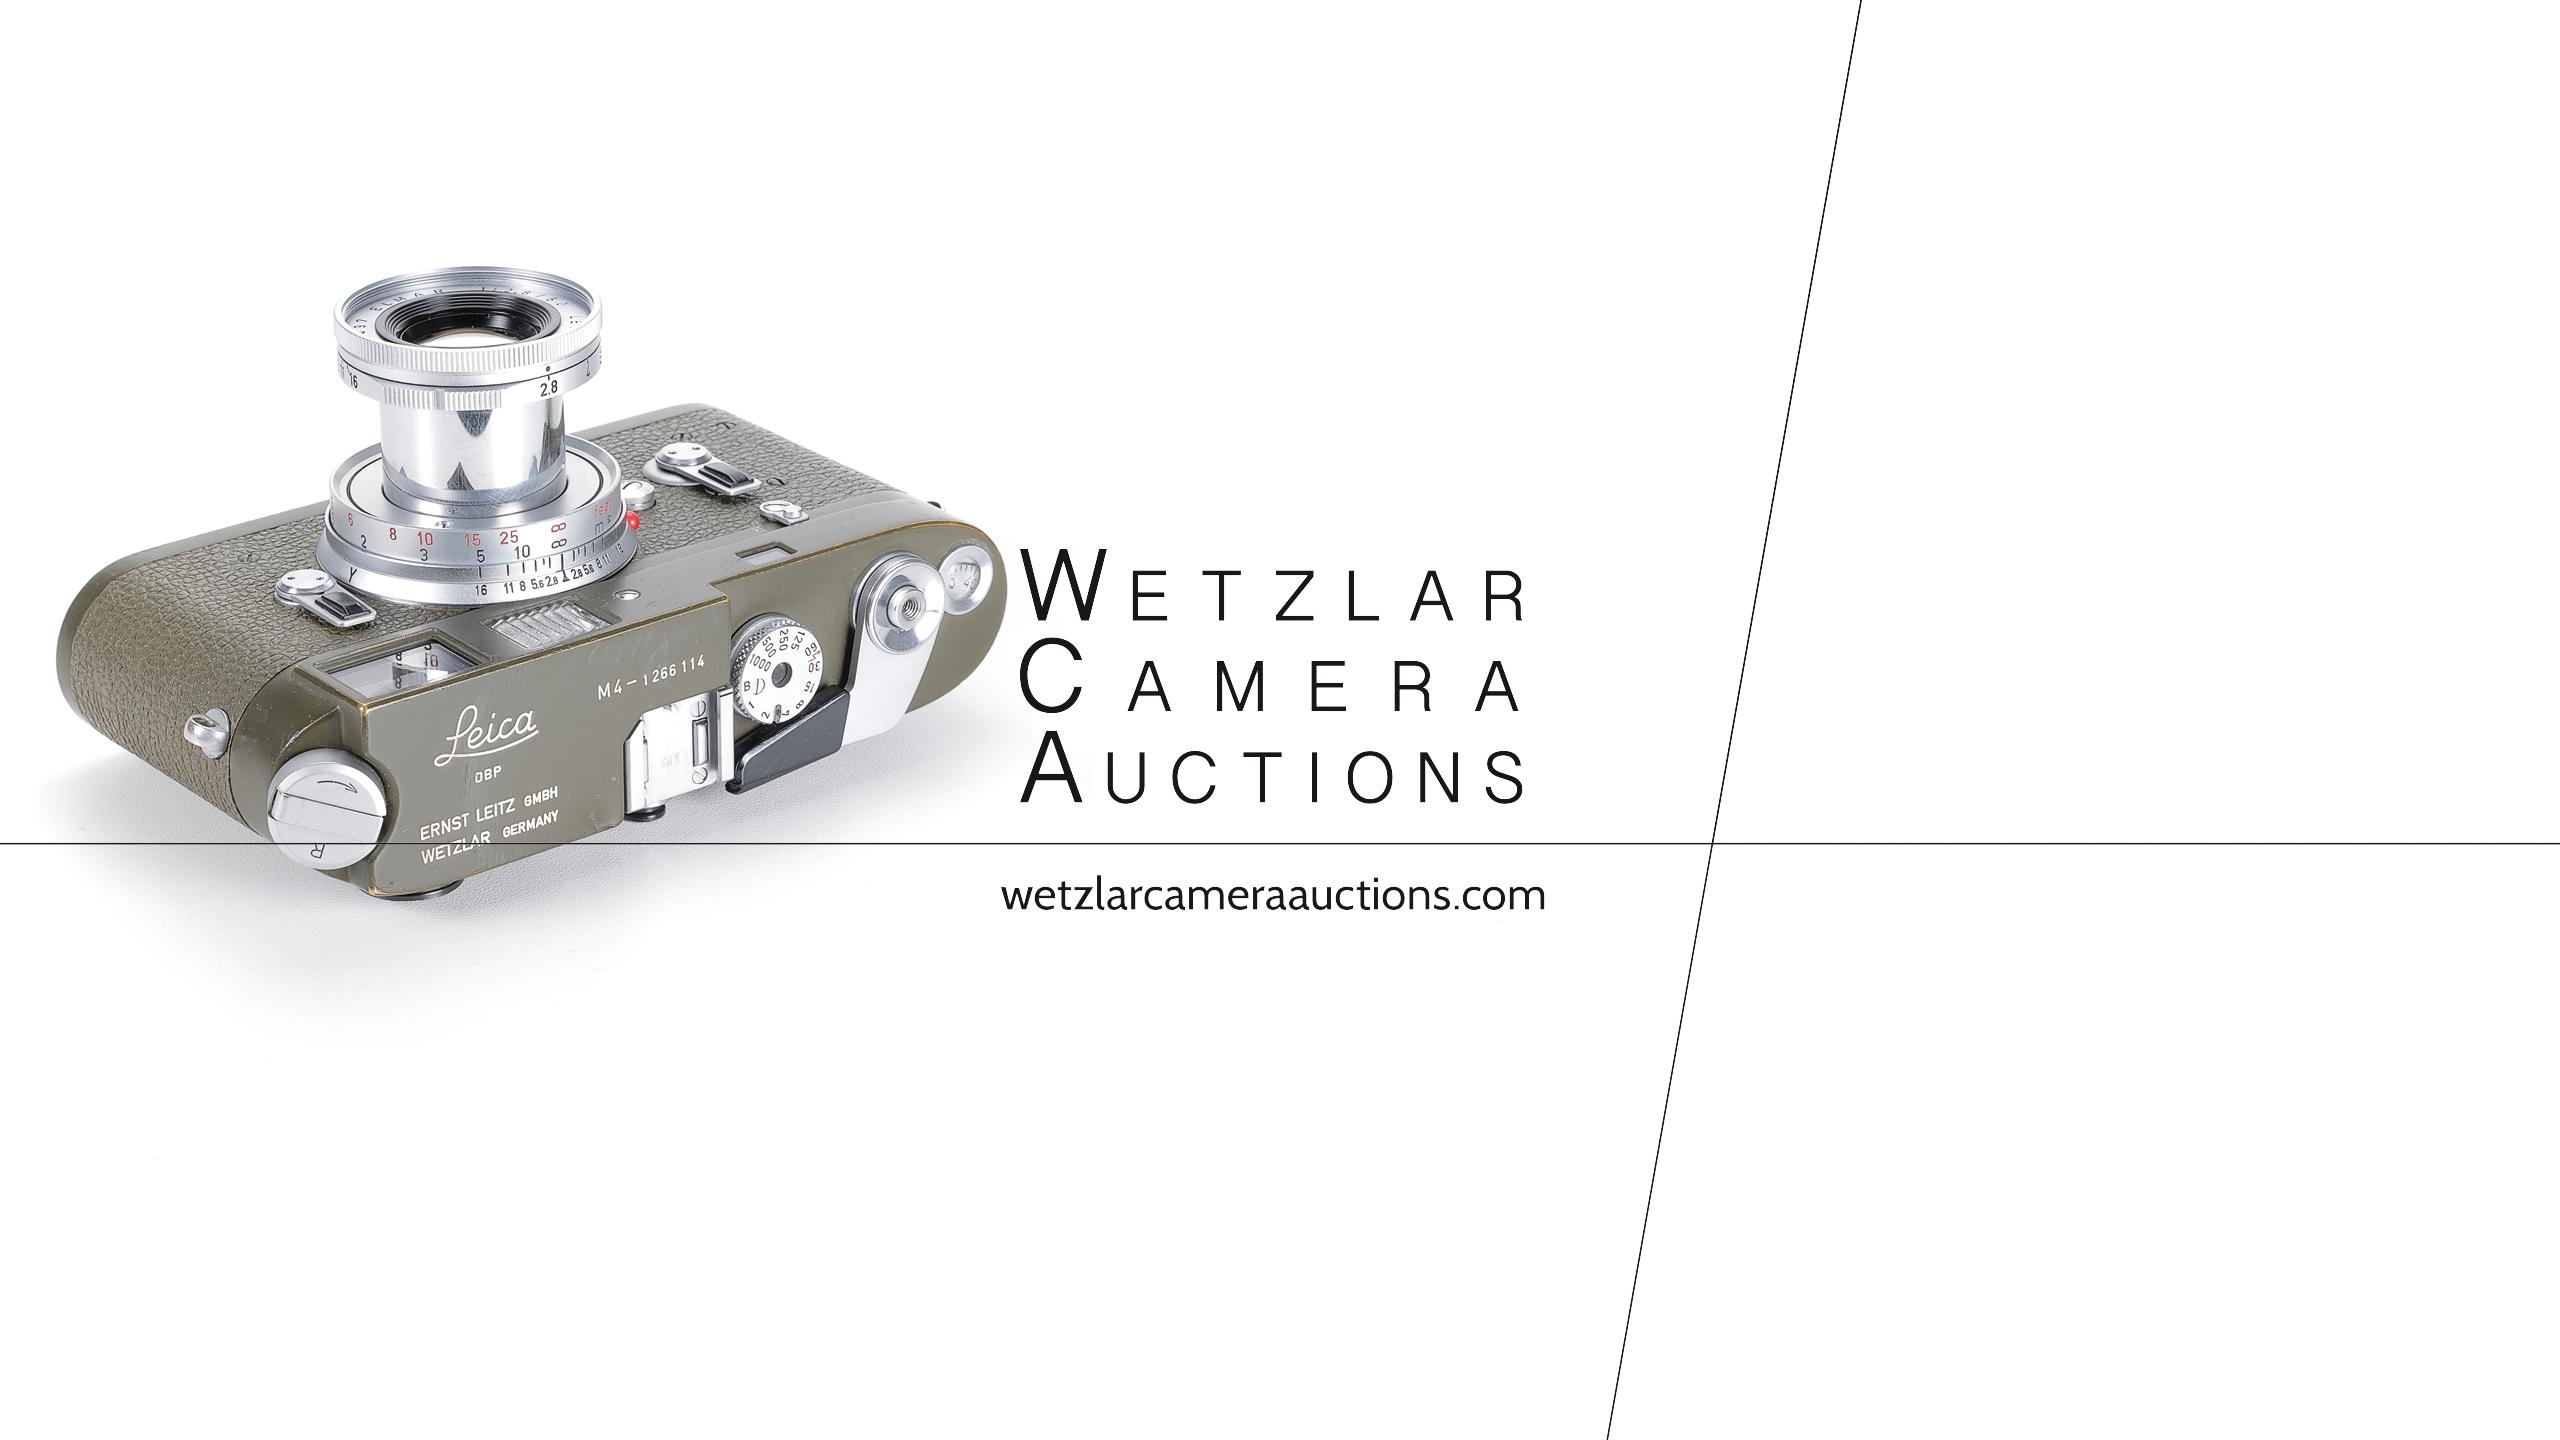 Wetzlar Camera Auctions - Leica M4 Olive